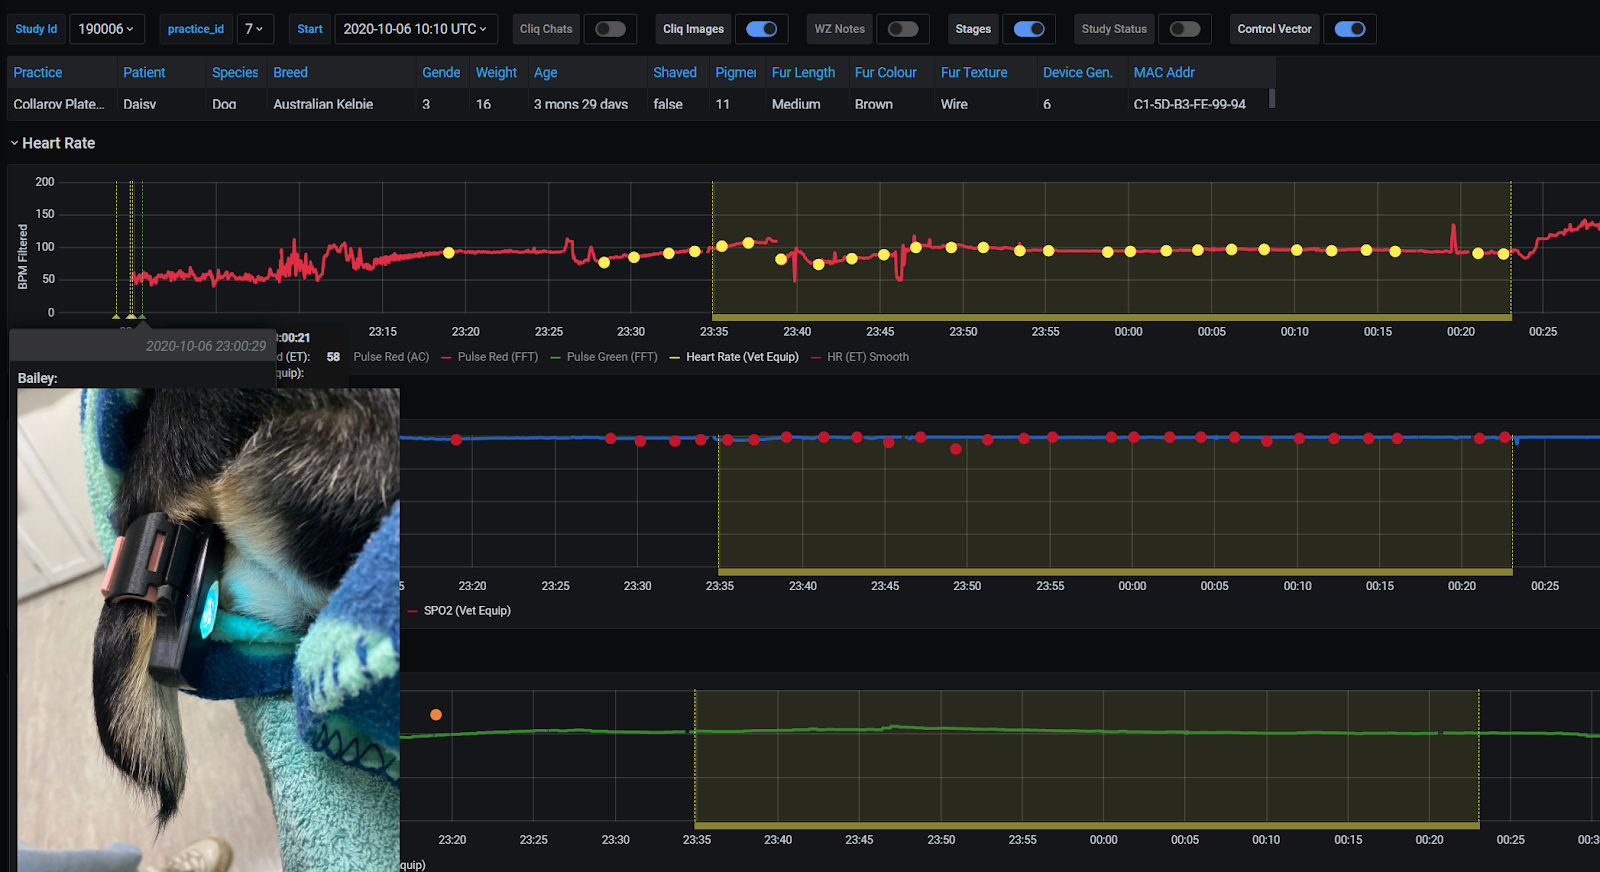 AVT's Custom Analytics Platform - Drives Validation and Analysis